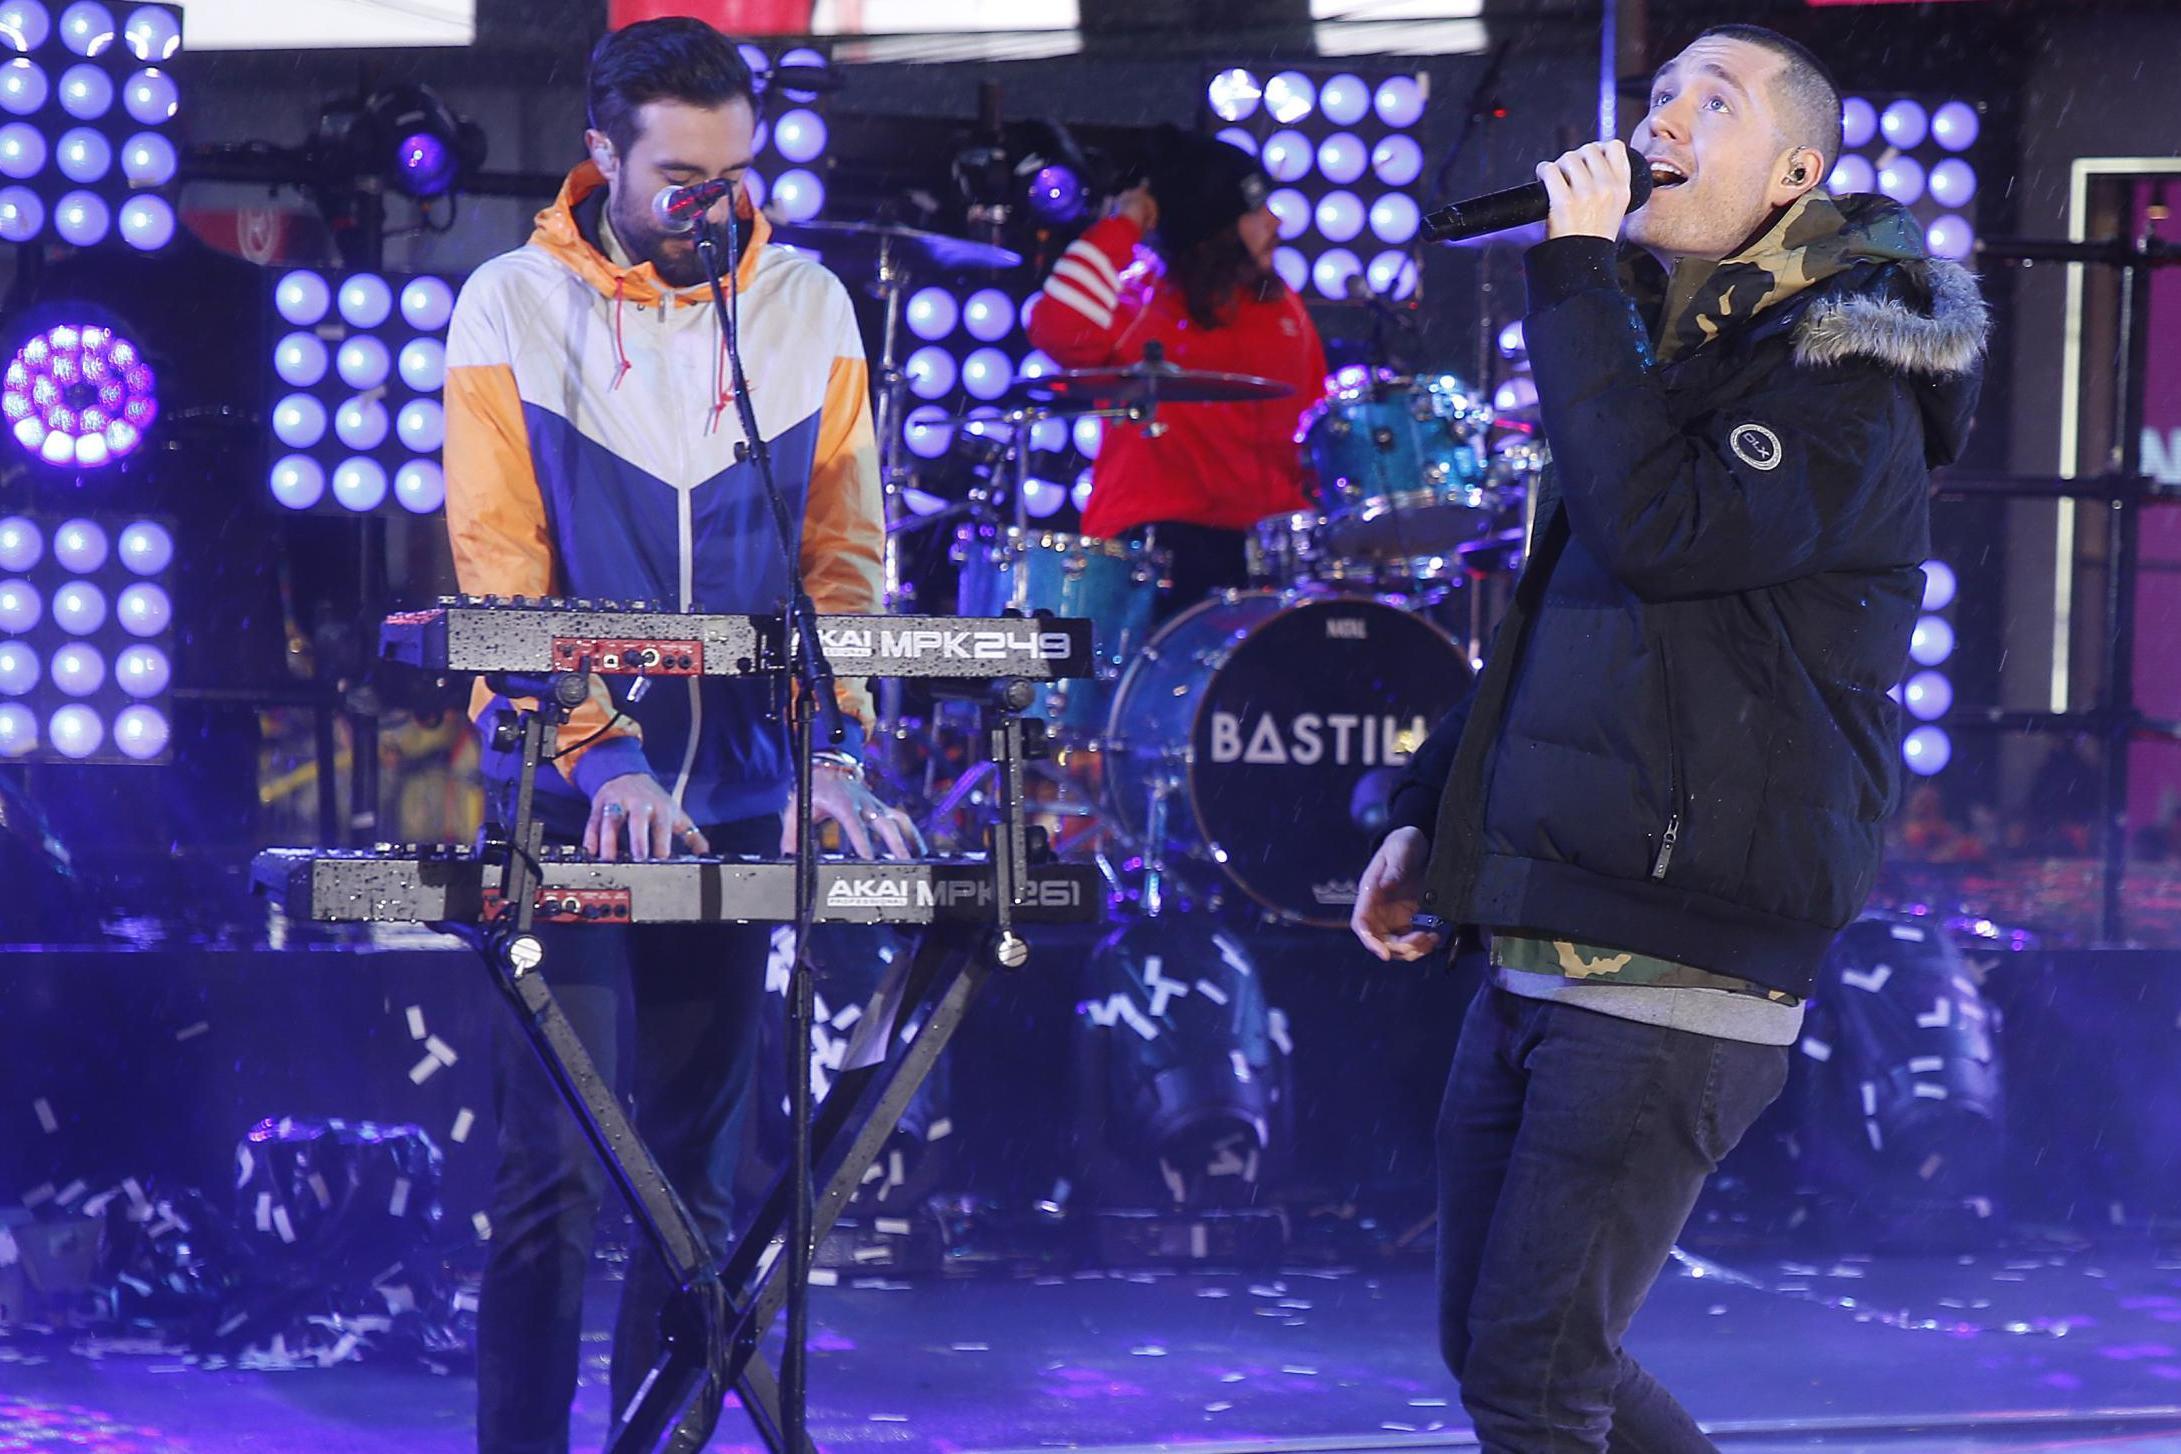 Bastille announce next album Doom Days as they release new single Joy